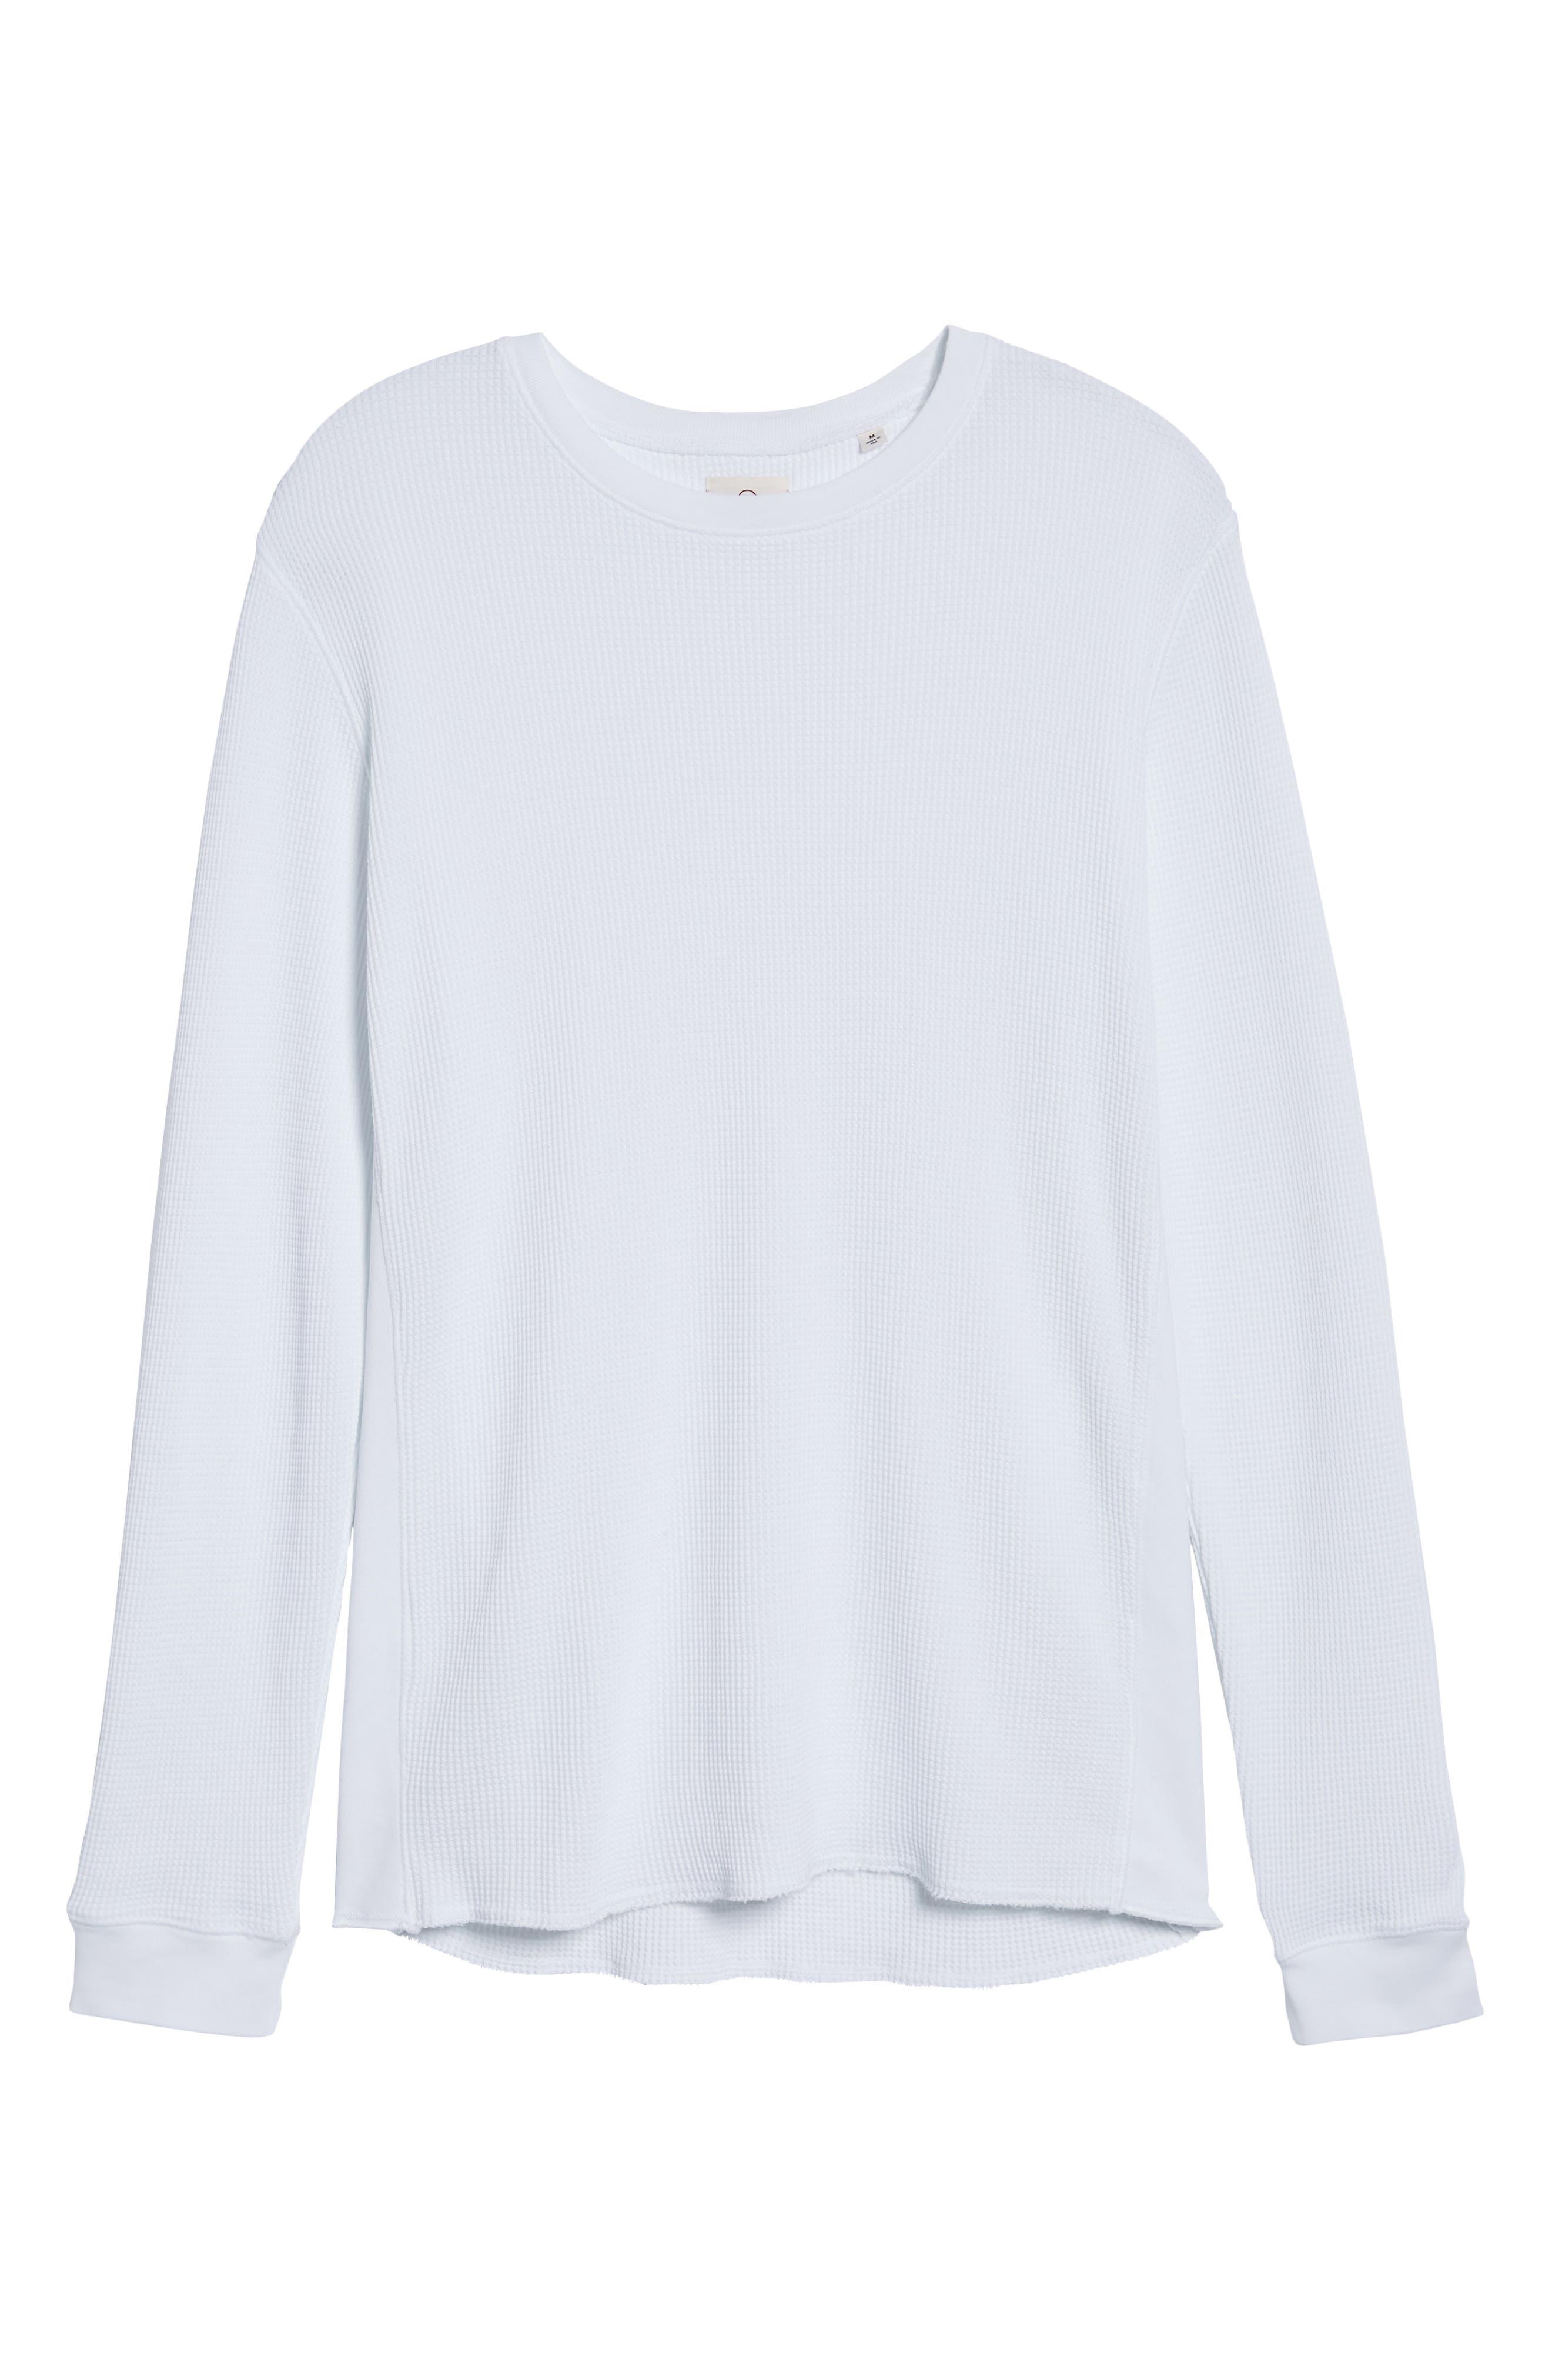 Travis Slim Fit Long Sleeve T-Shirt,                             Alternate thumbnail 6, color,                             True White